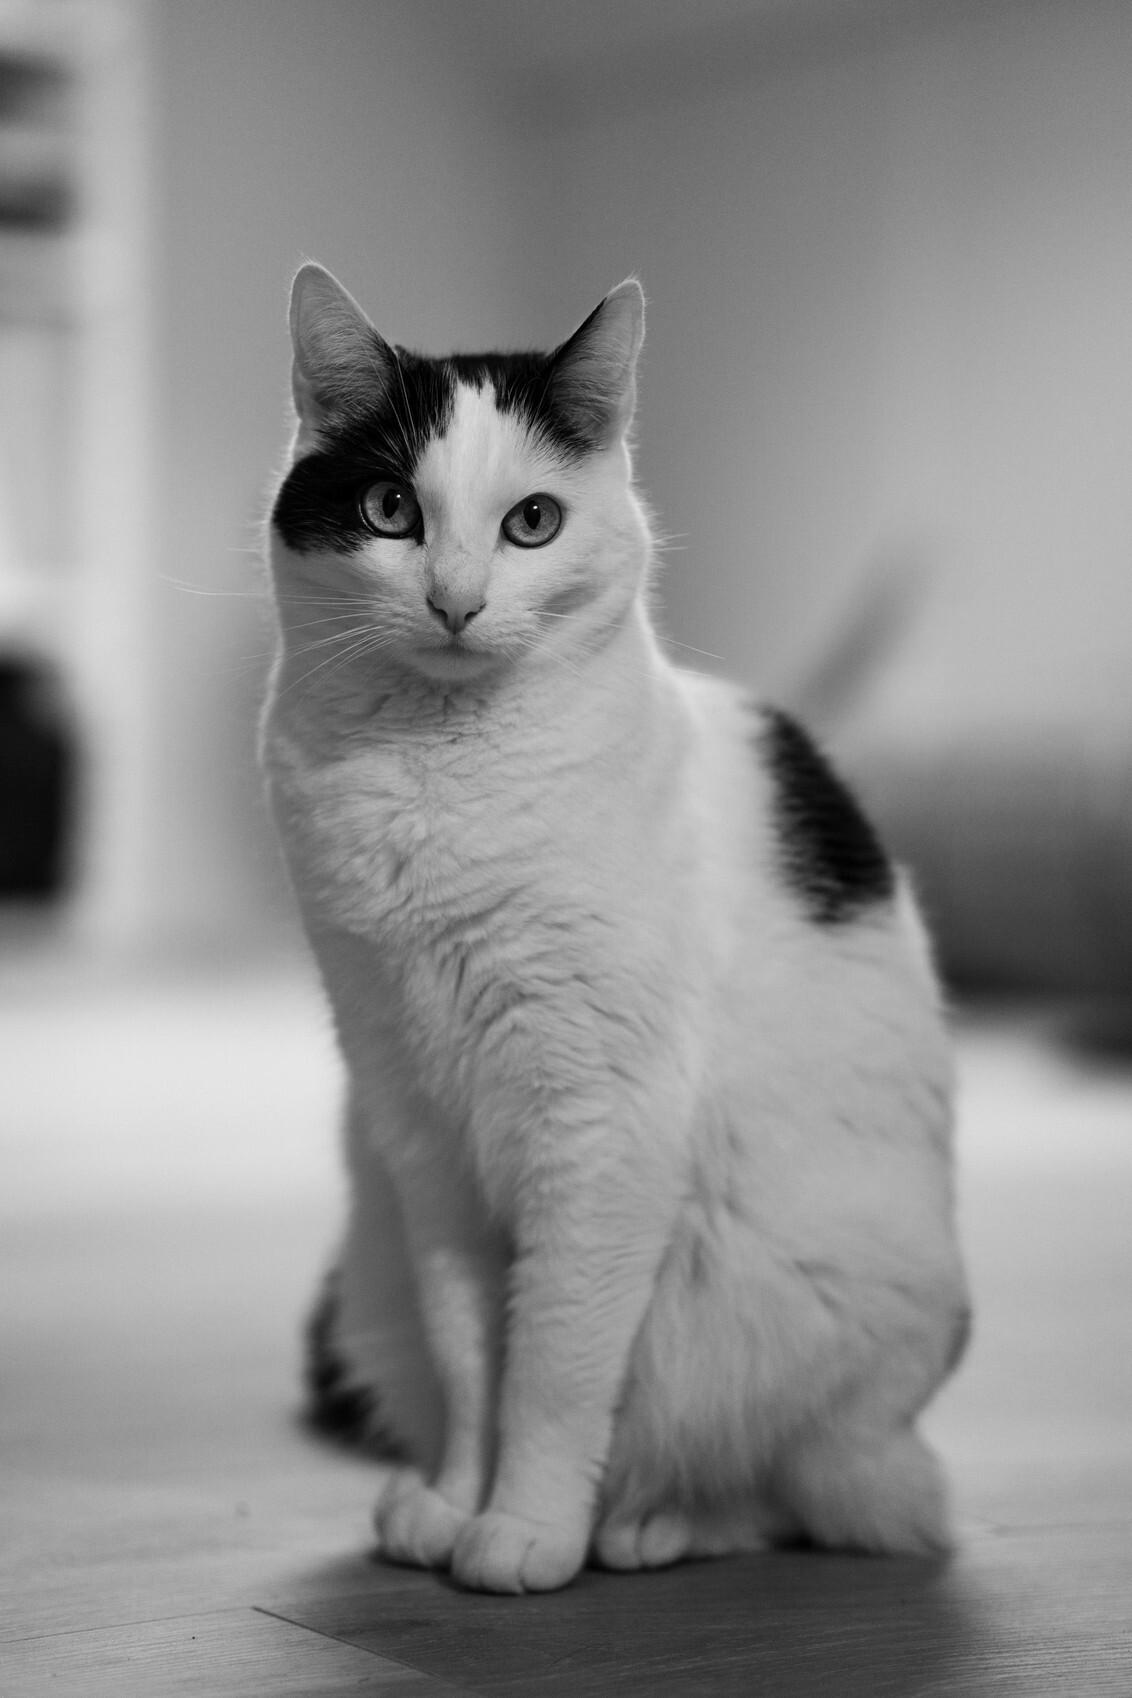 Luna - - - foto door Ekrul op 05-02-2020 - deze foto bevat: wit, esther, black, poes, zwart, huisdier, kat, dier, lief, zw, mooi, luna, jong, bw, white, vlekjes, krul, fotografie, cat, schattig, huisdierfotografie, vlek, estherkrul, eskrul